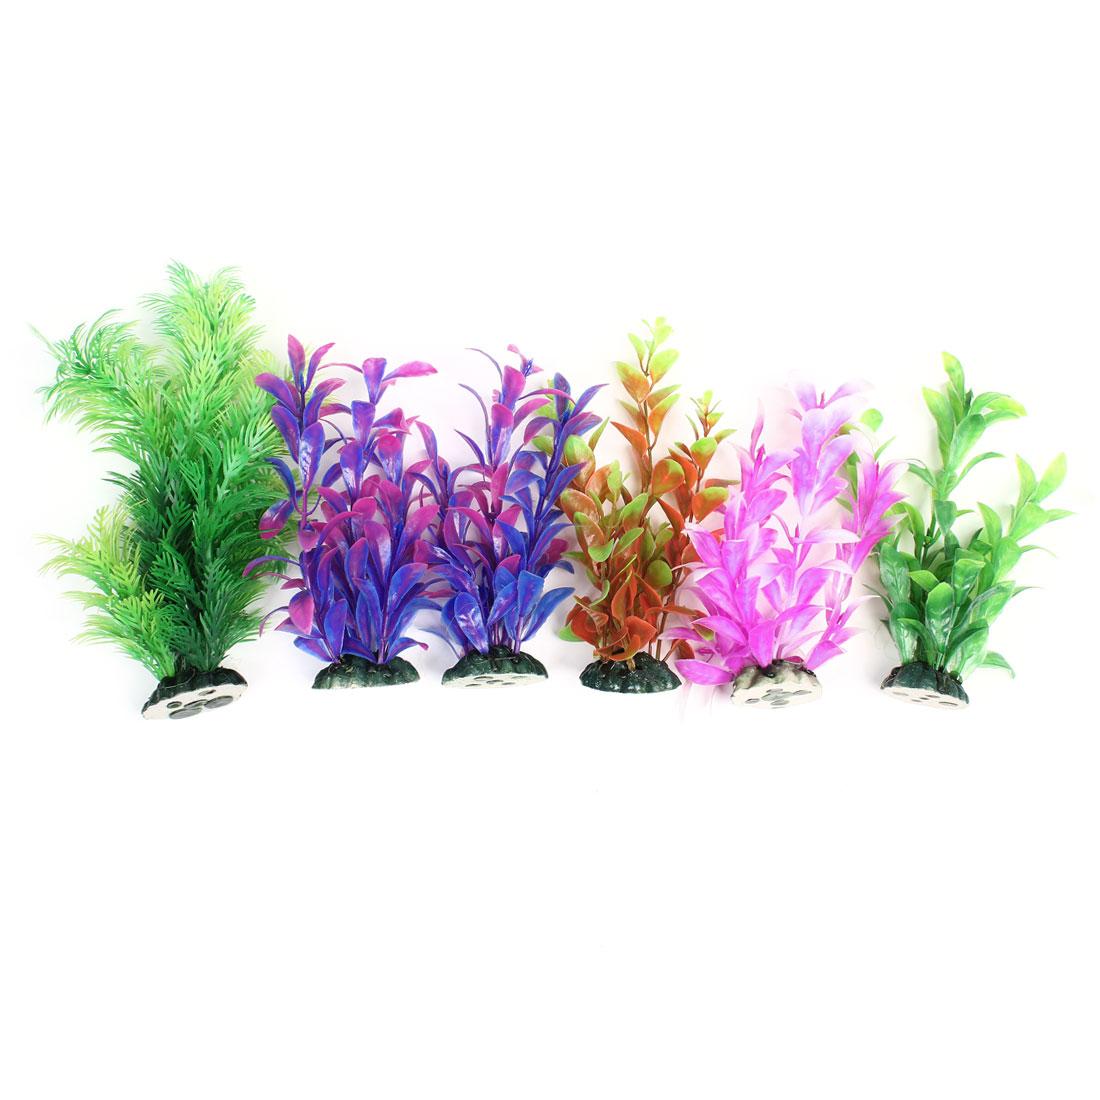 "6 Pcs 7.5"" High Artificial Water Grass for Fish Tank Aquarium"